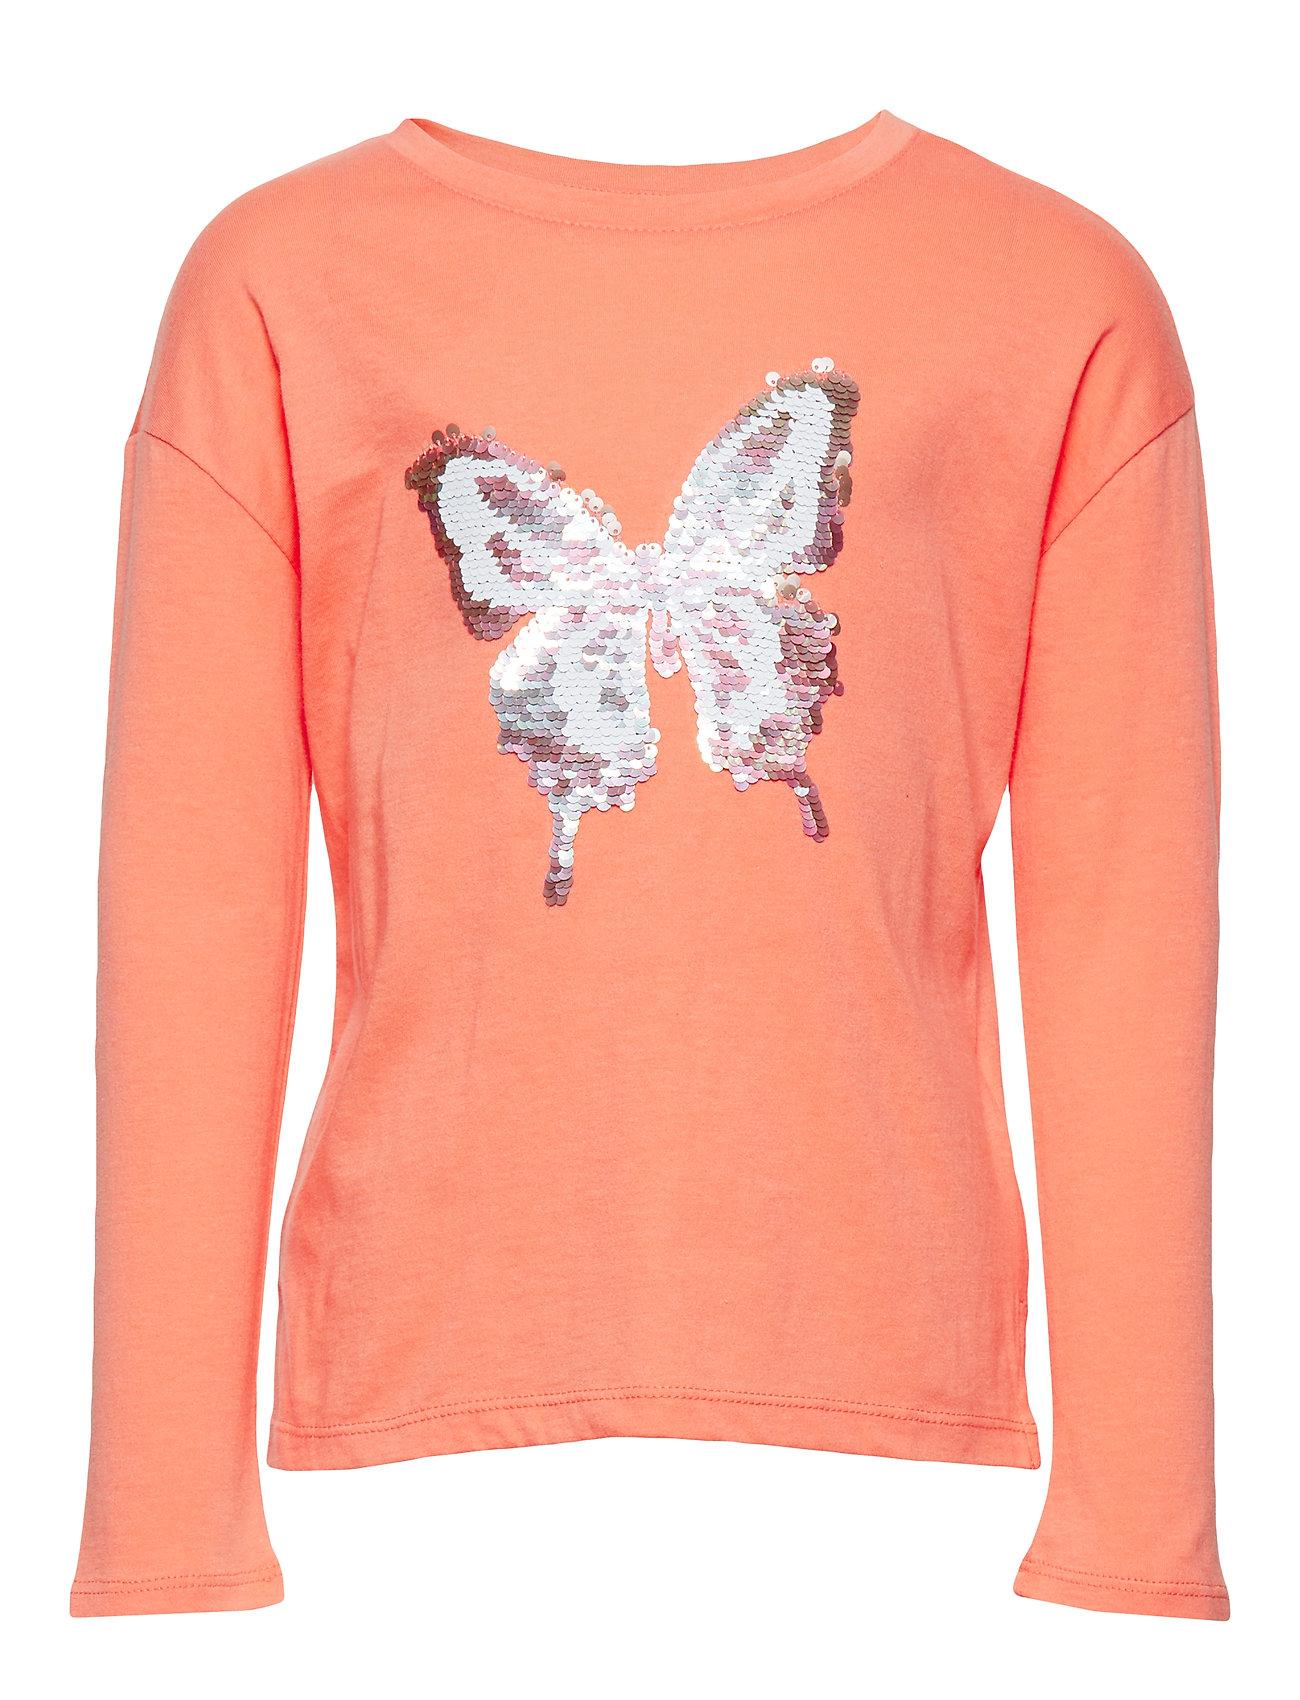 Image of Kids Flippy Sequin Graphic T-Shirt Langærmet T-shirt Orange GAP (3264523683)